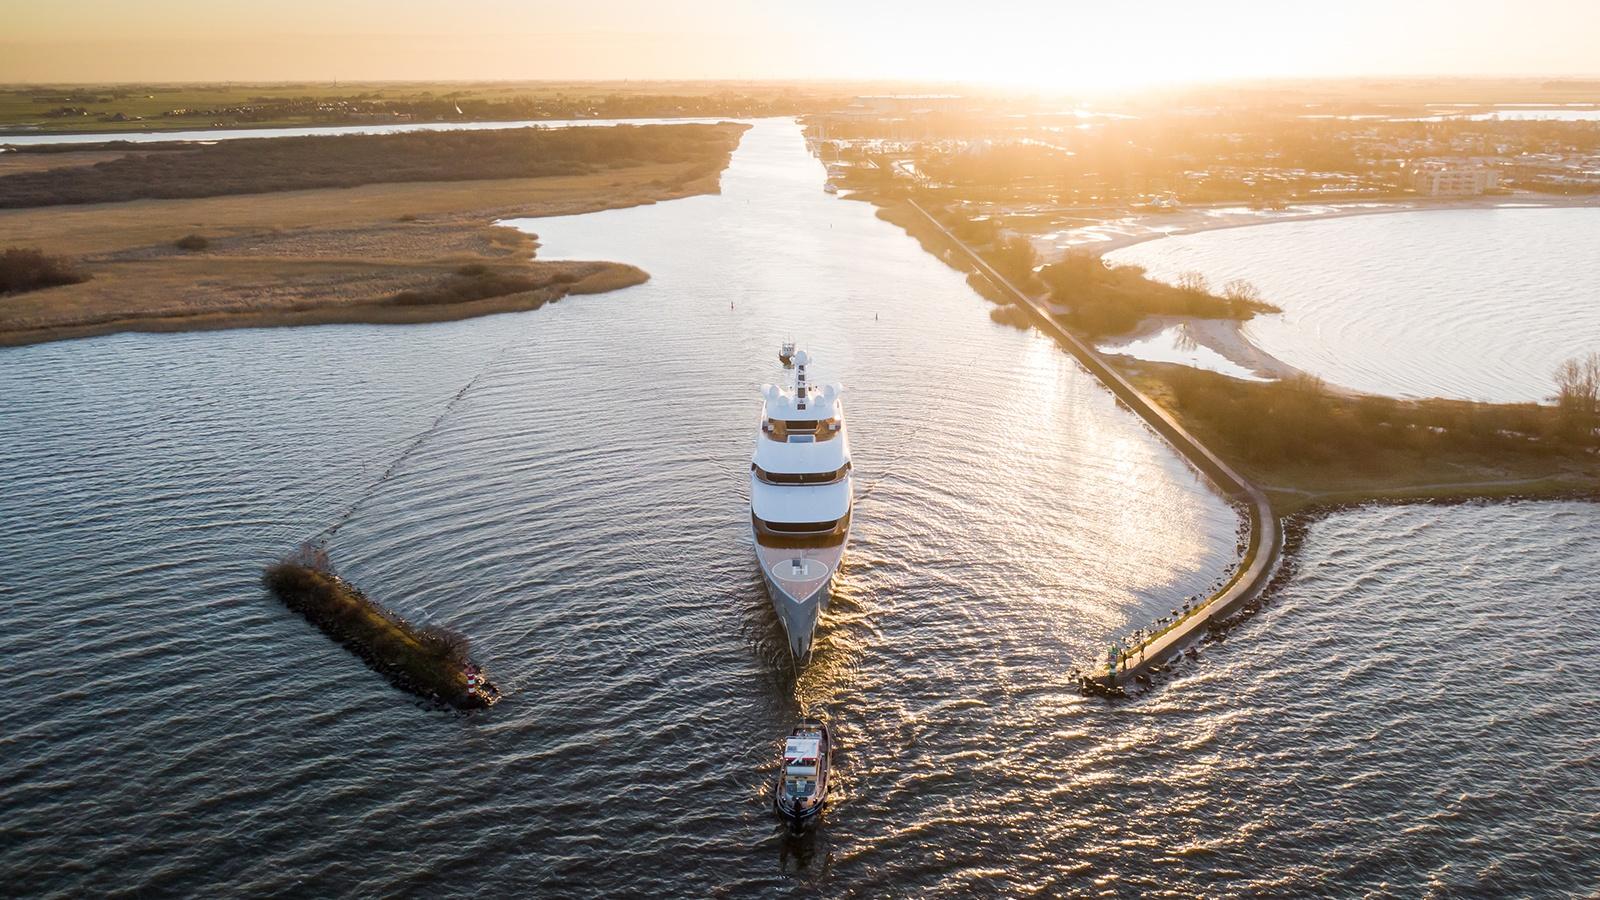 Superiate Moonrise Feadship - boat shopping